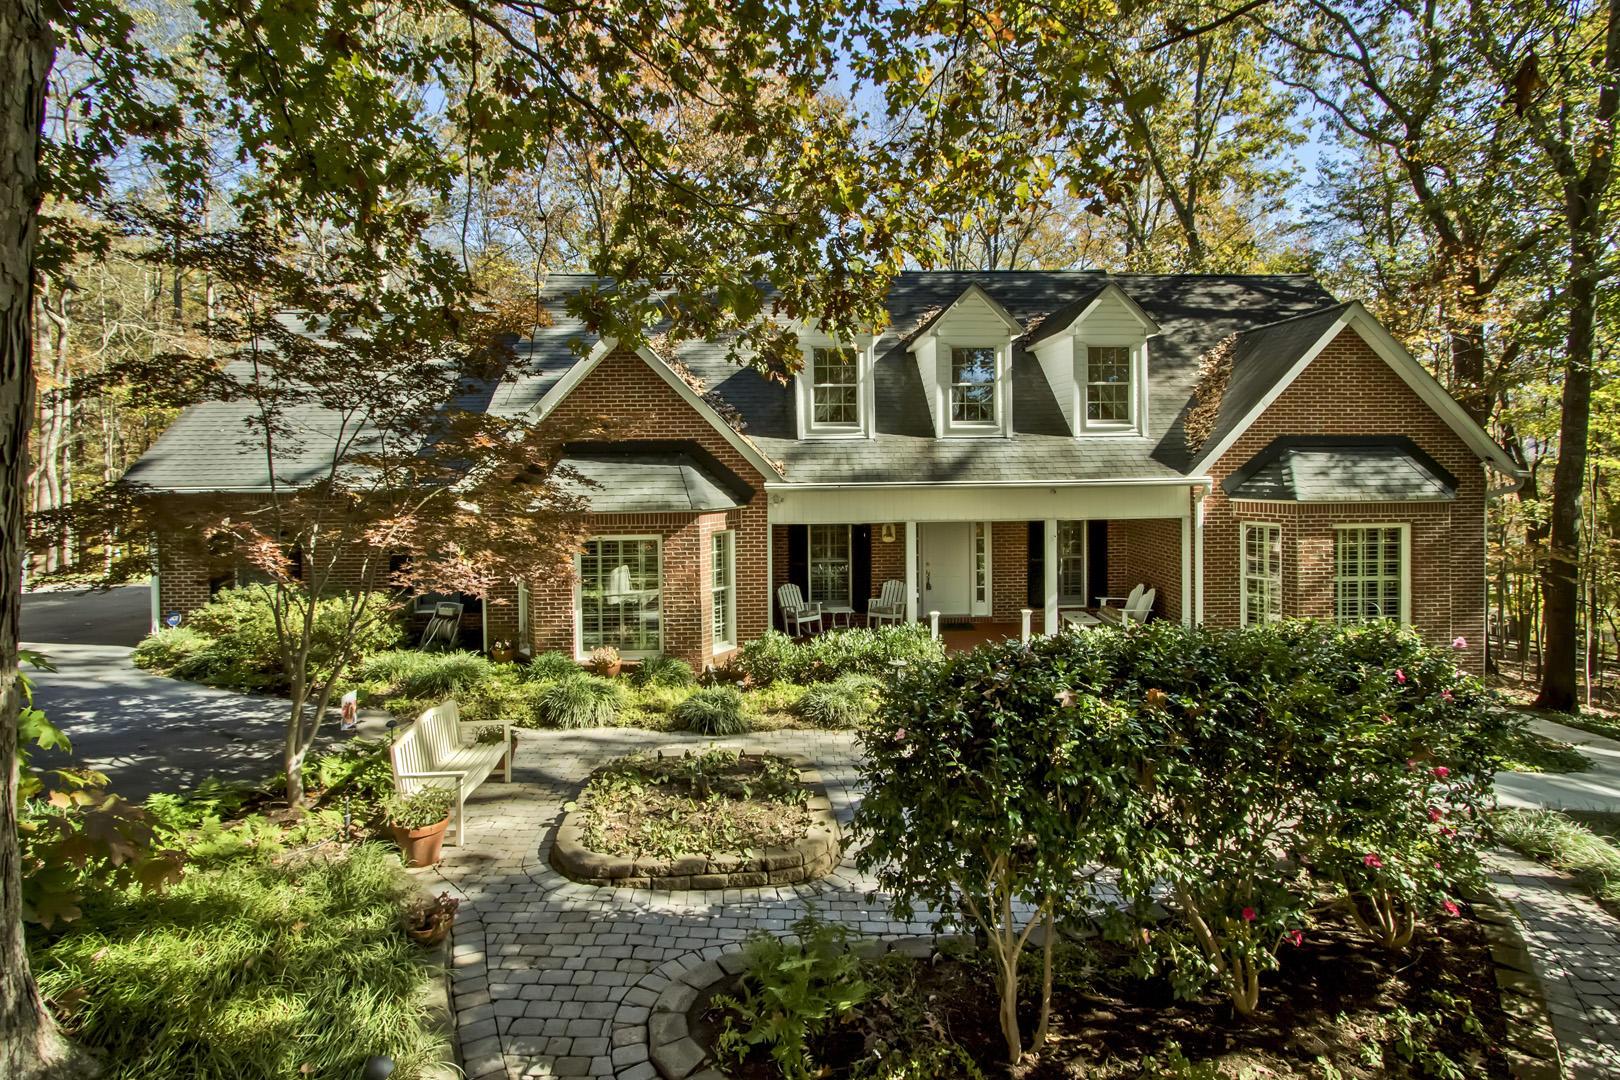 20191113161317222756000000-o Oak Ridge anderson county homes for sale